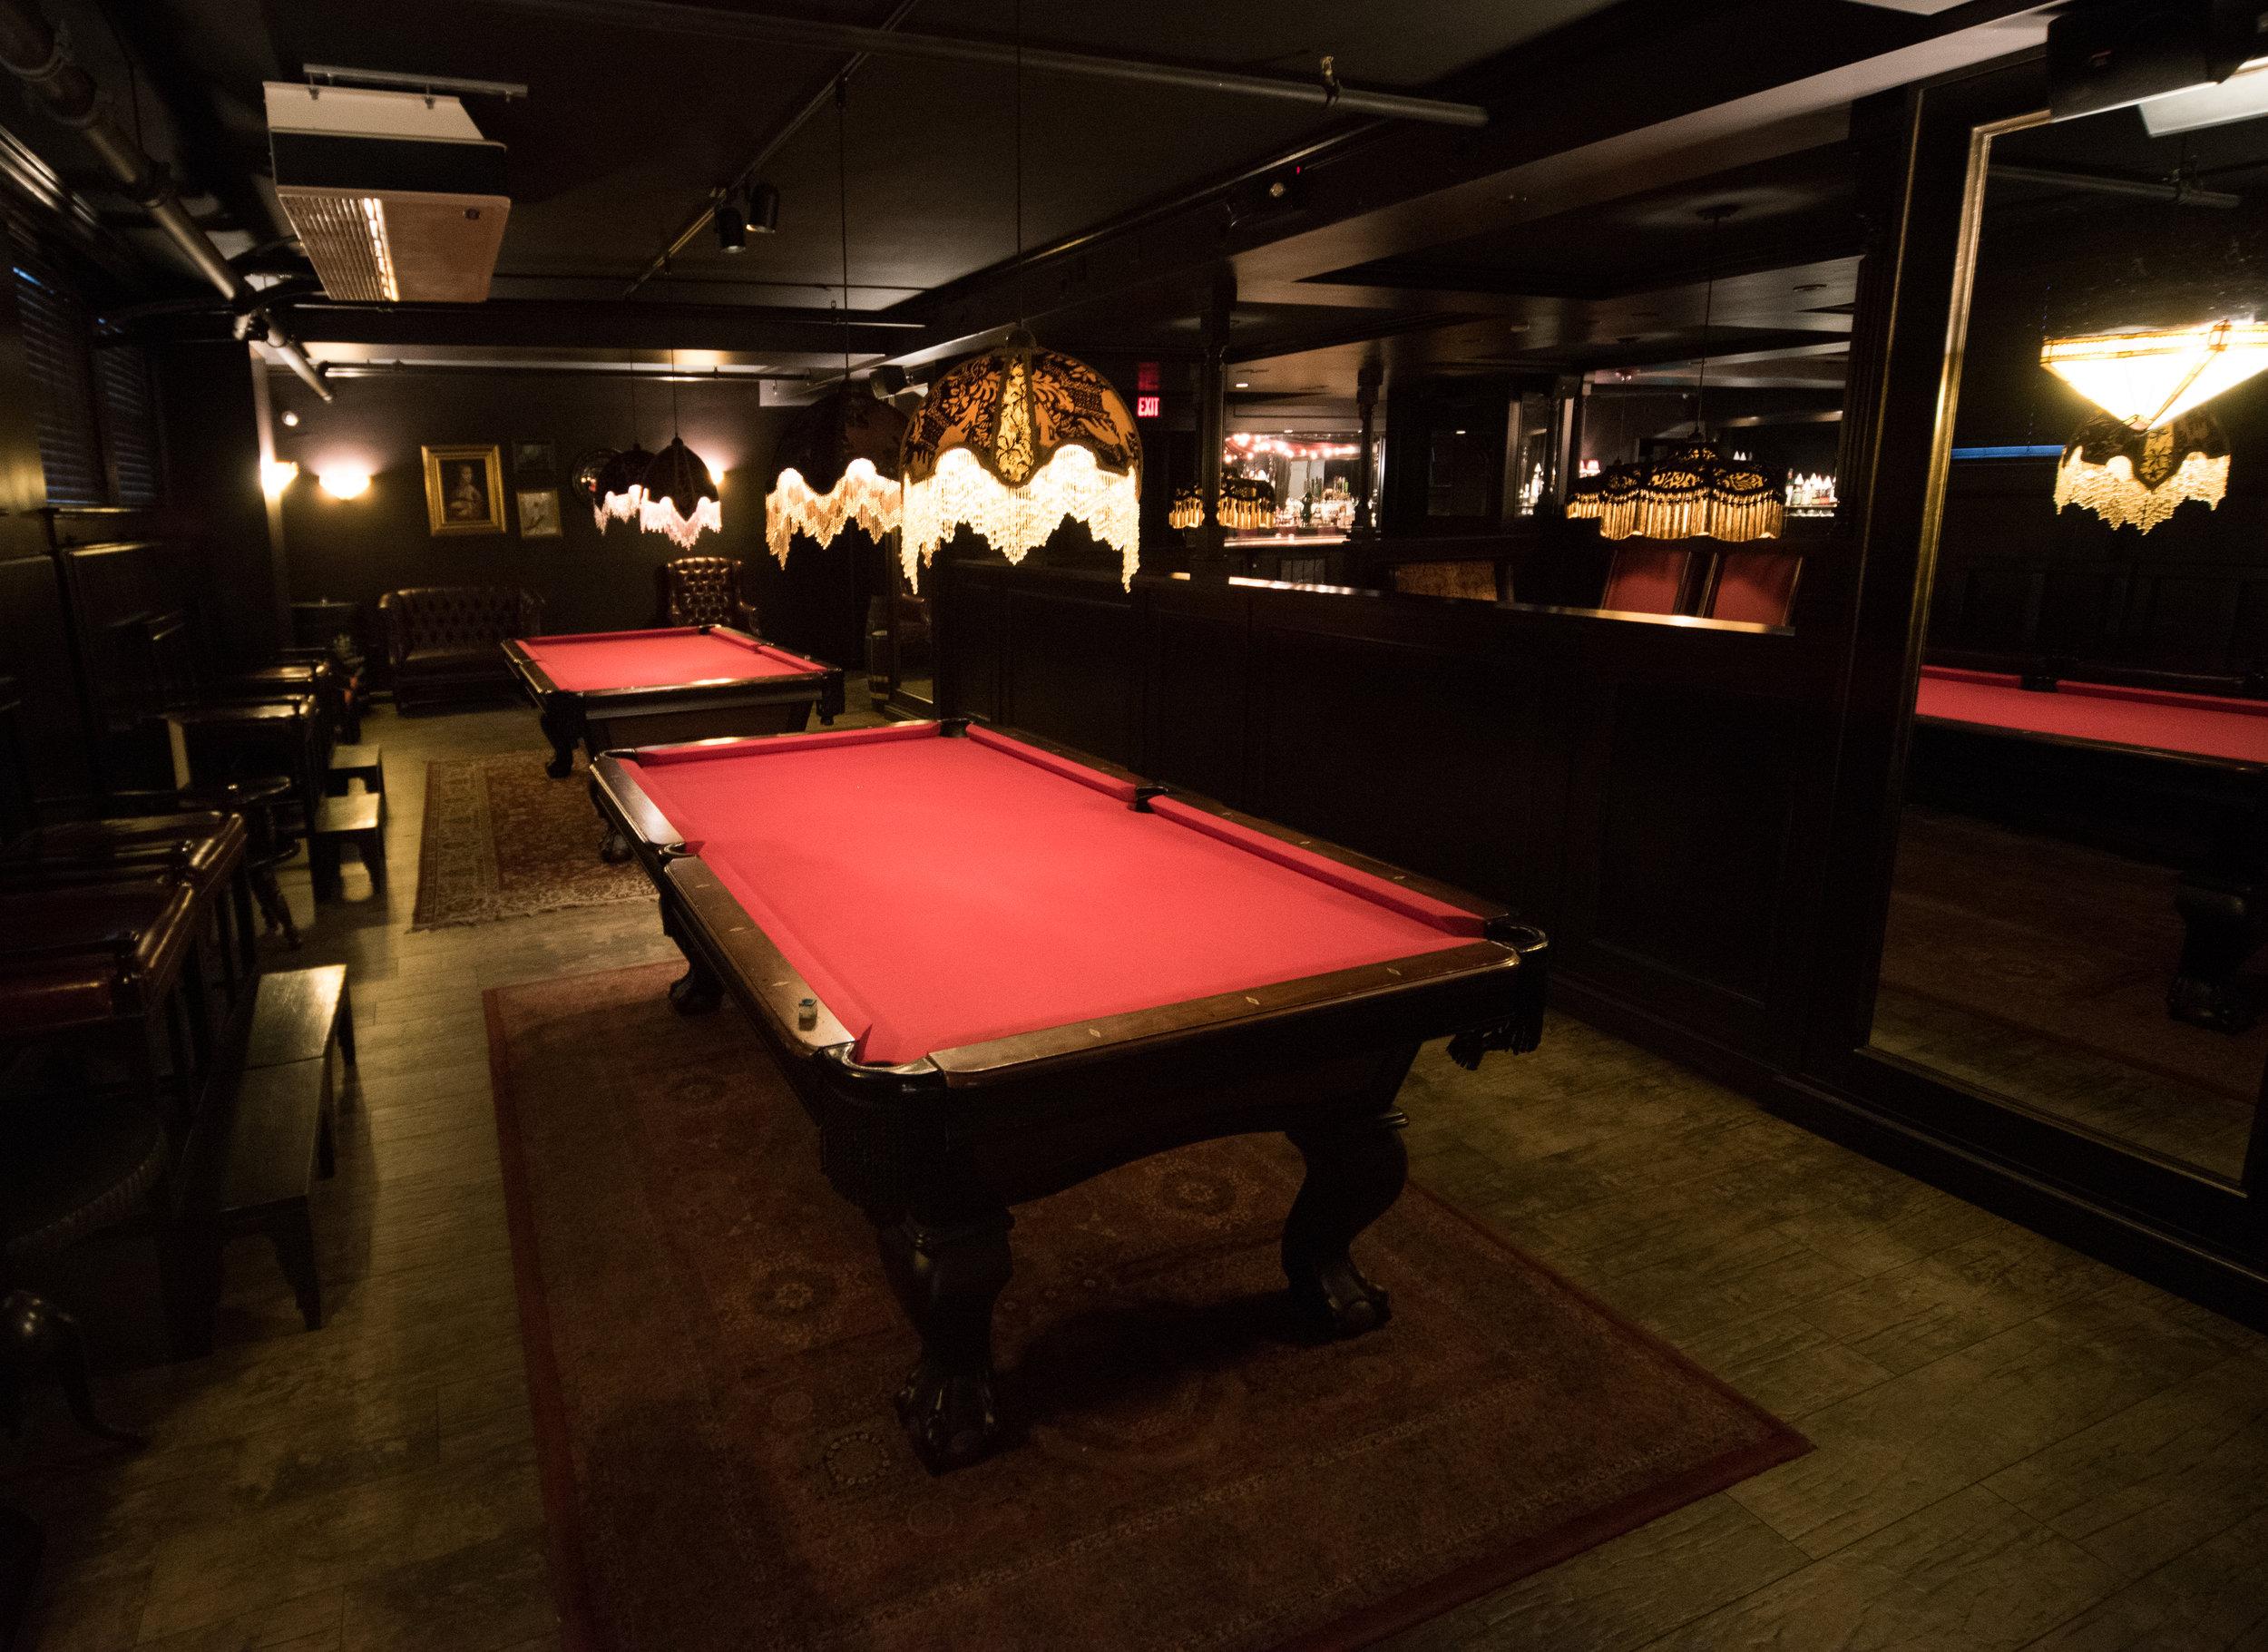 The Speakeasy Billiards